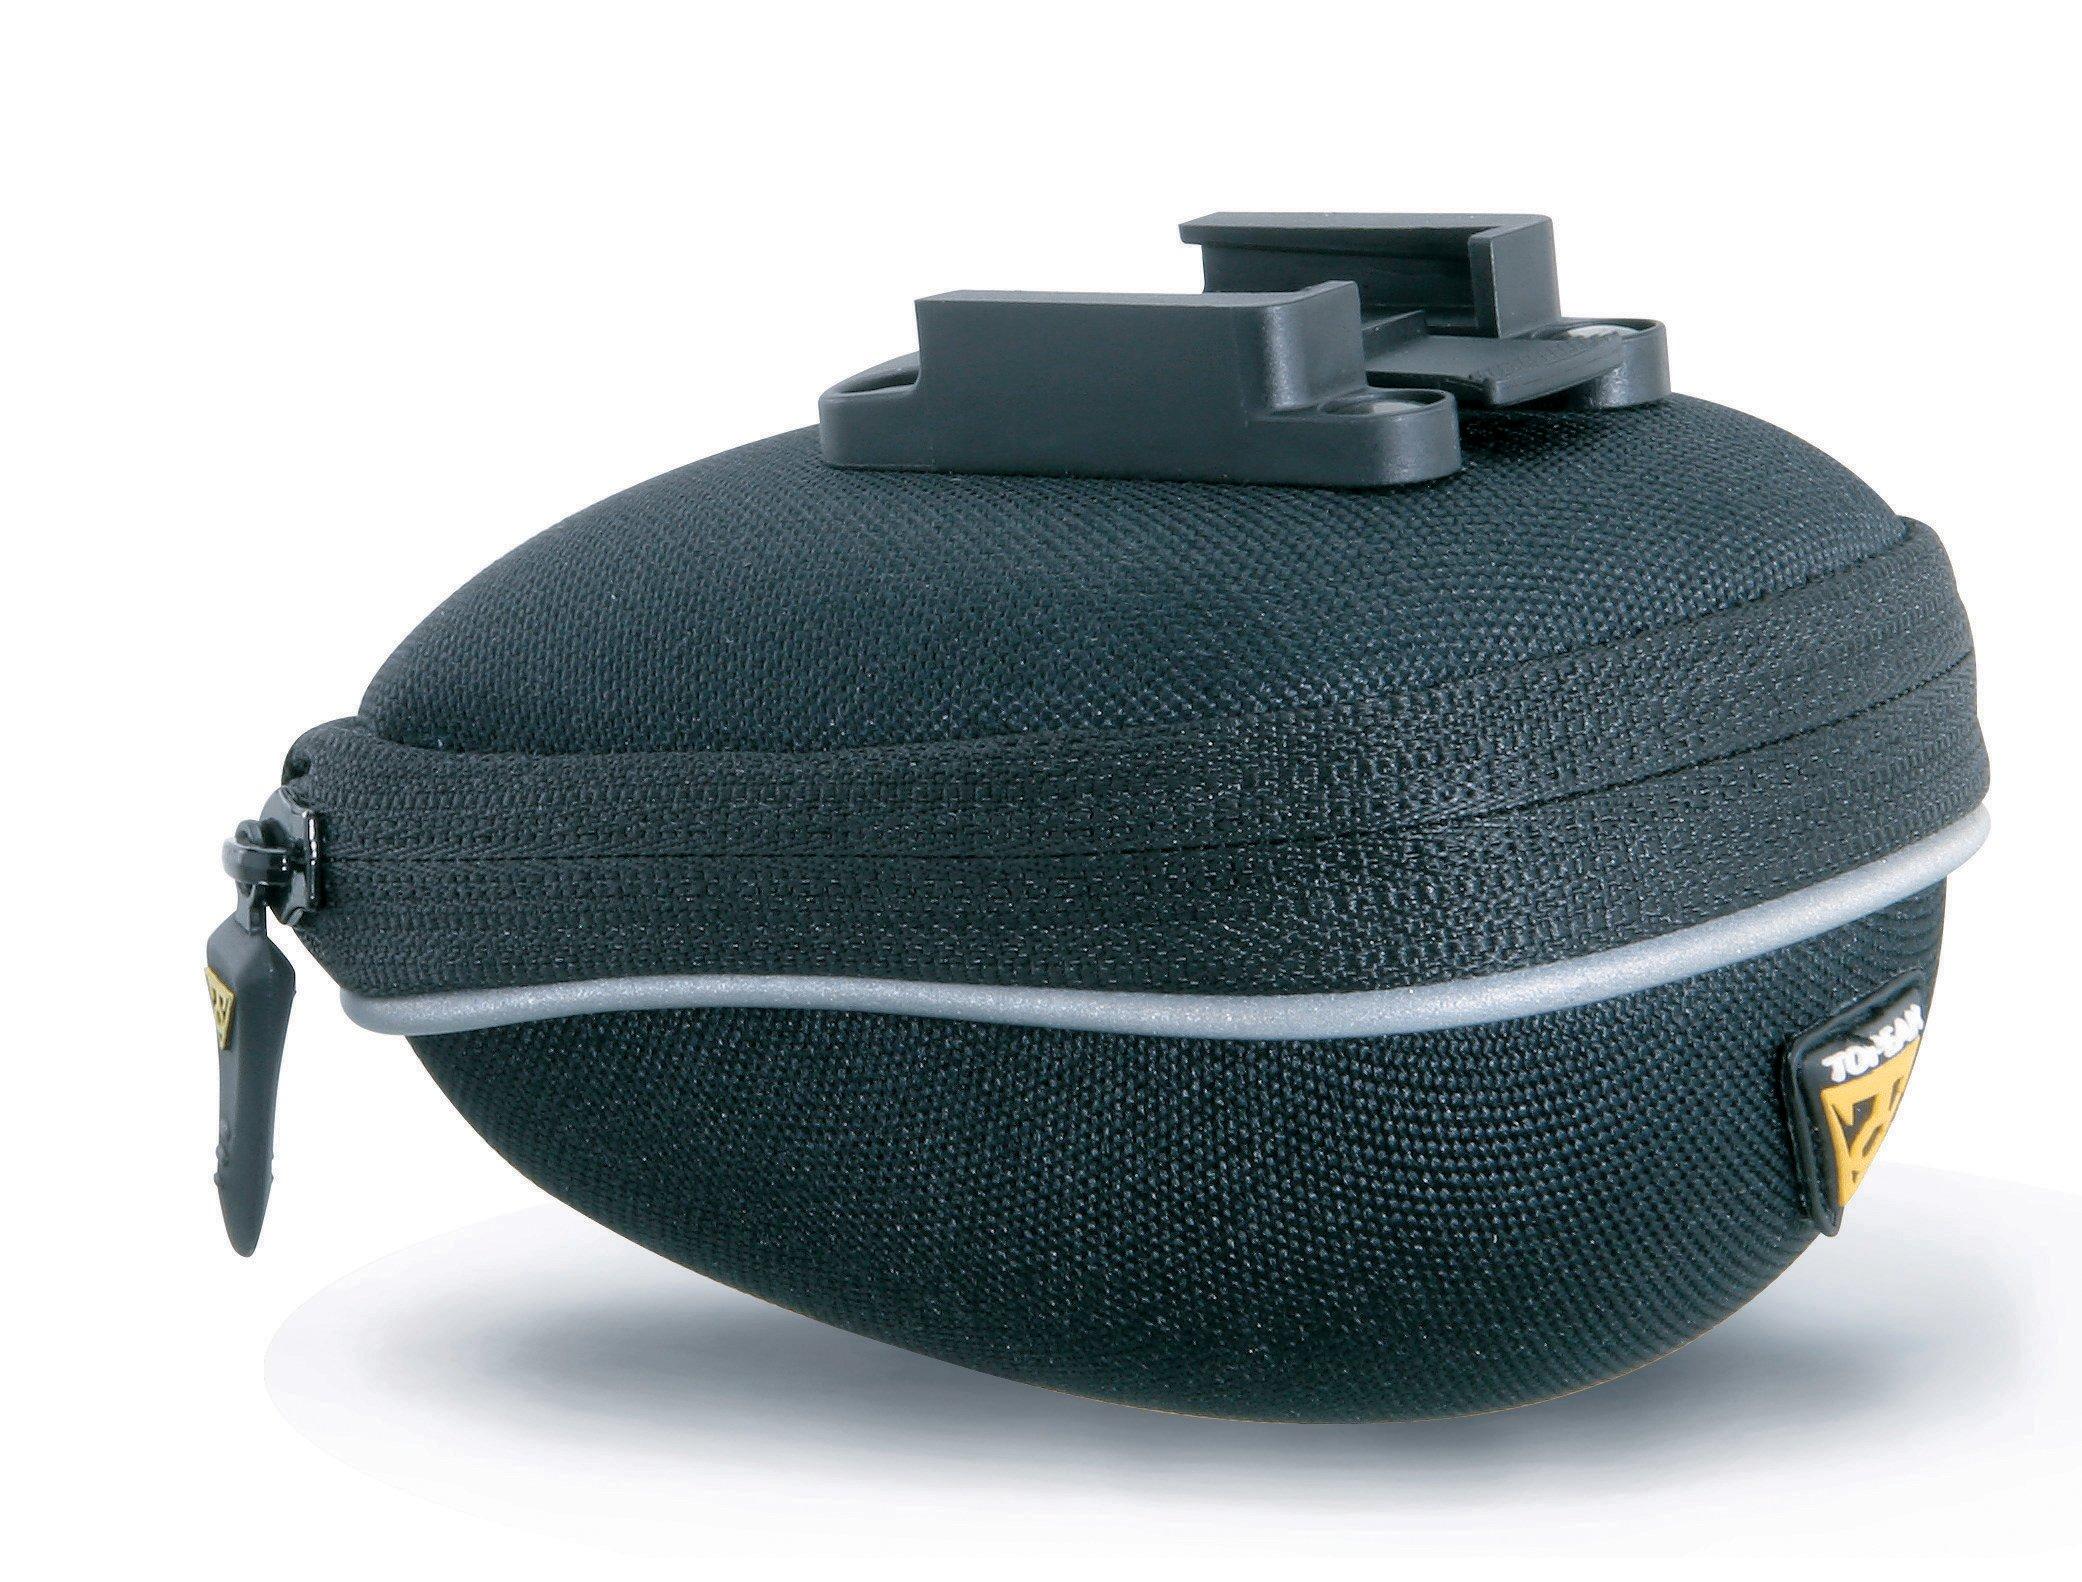 Topeak Pro Pack Micro Seat Pack